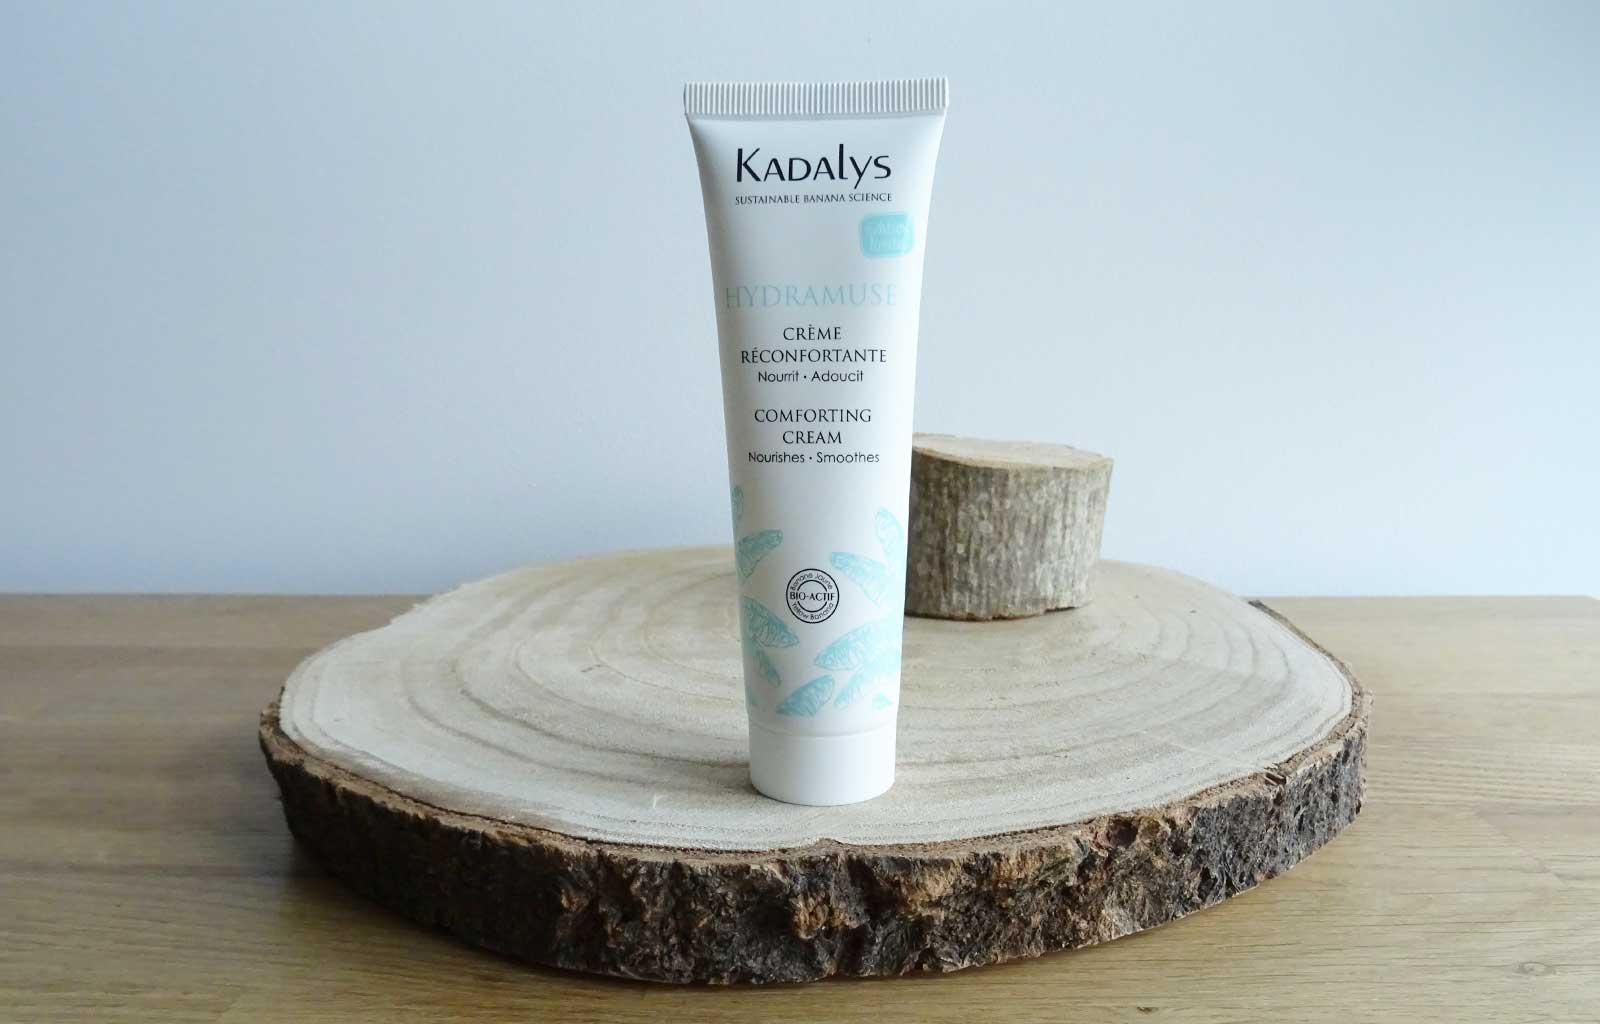 Kadalys crème réconfortante hydramuse